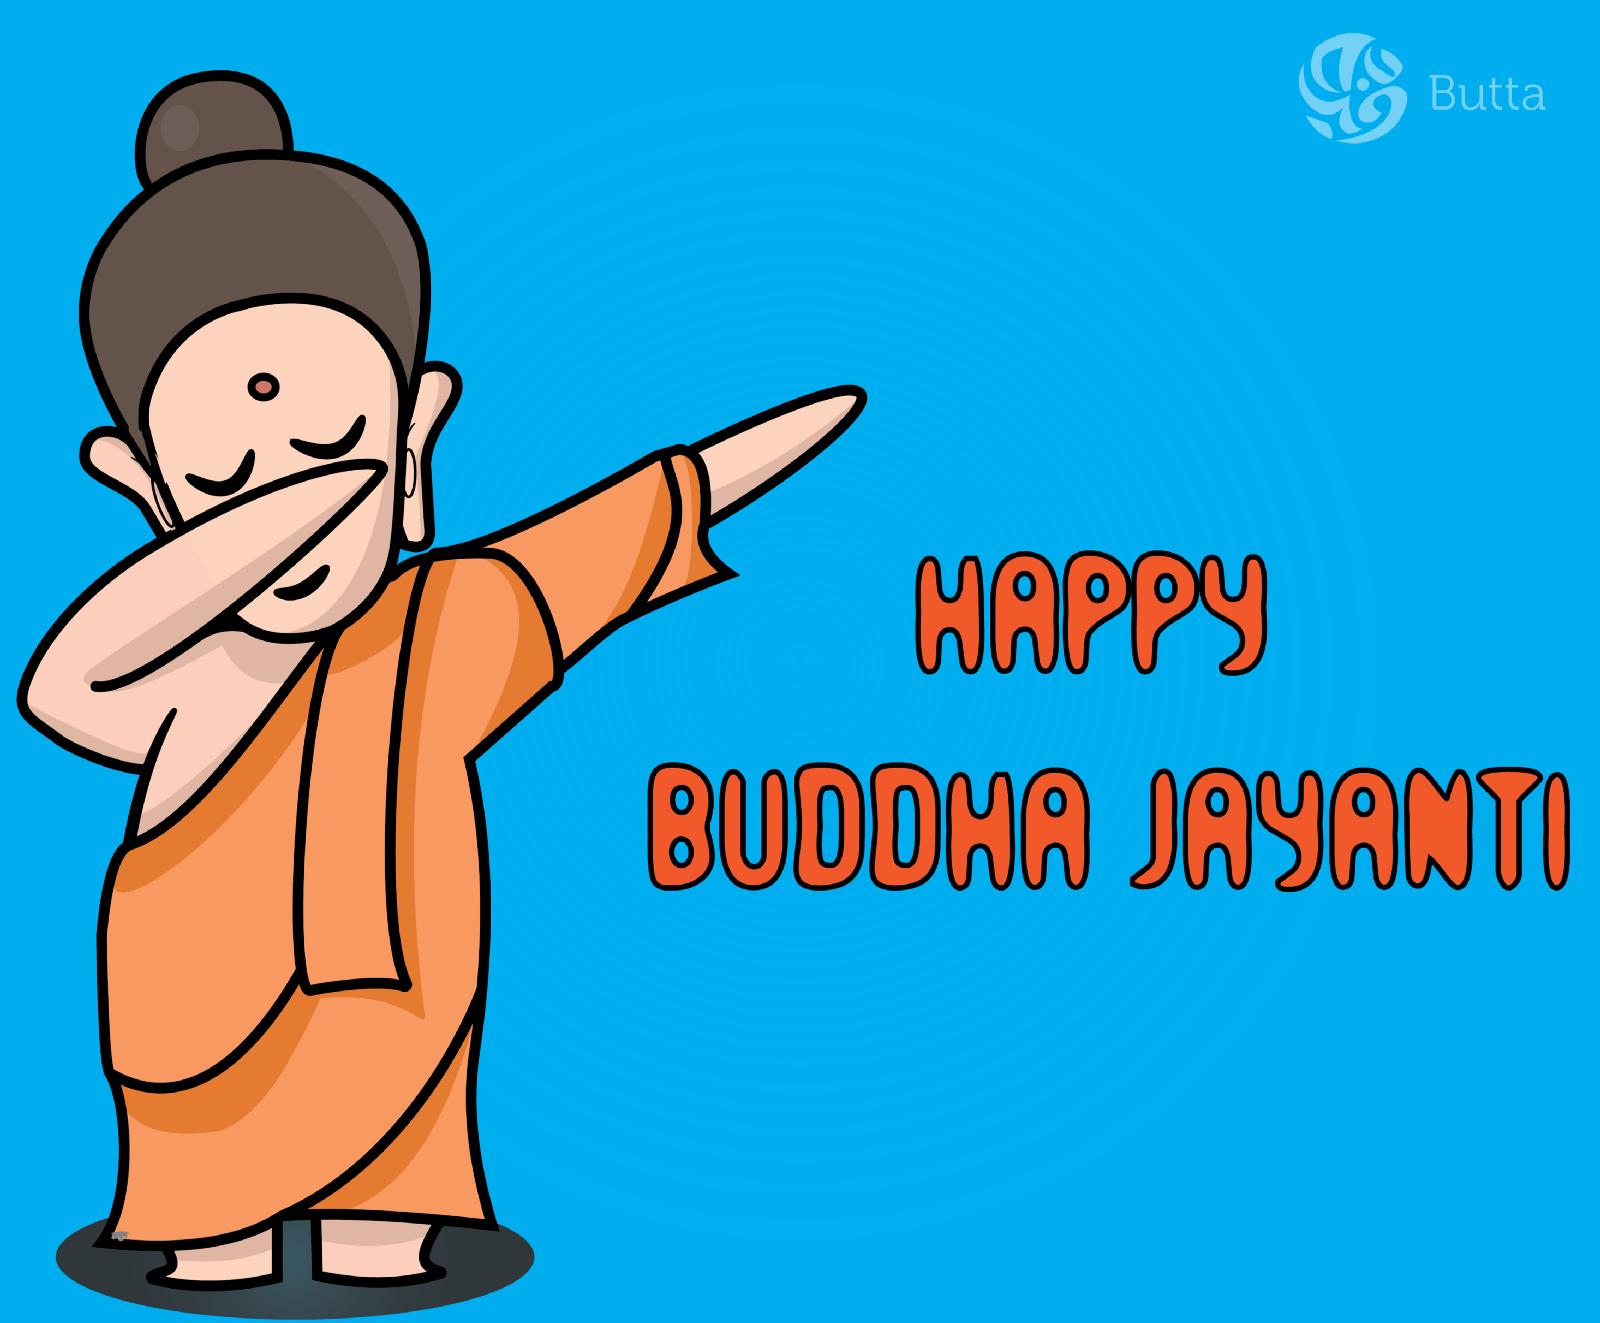 Happy buddha jayanti butta. Website clipart nonliving thing